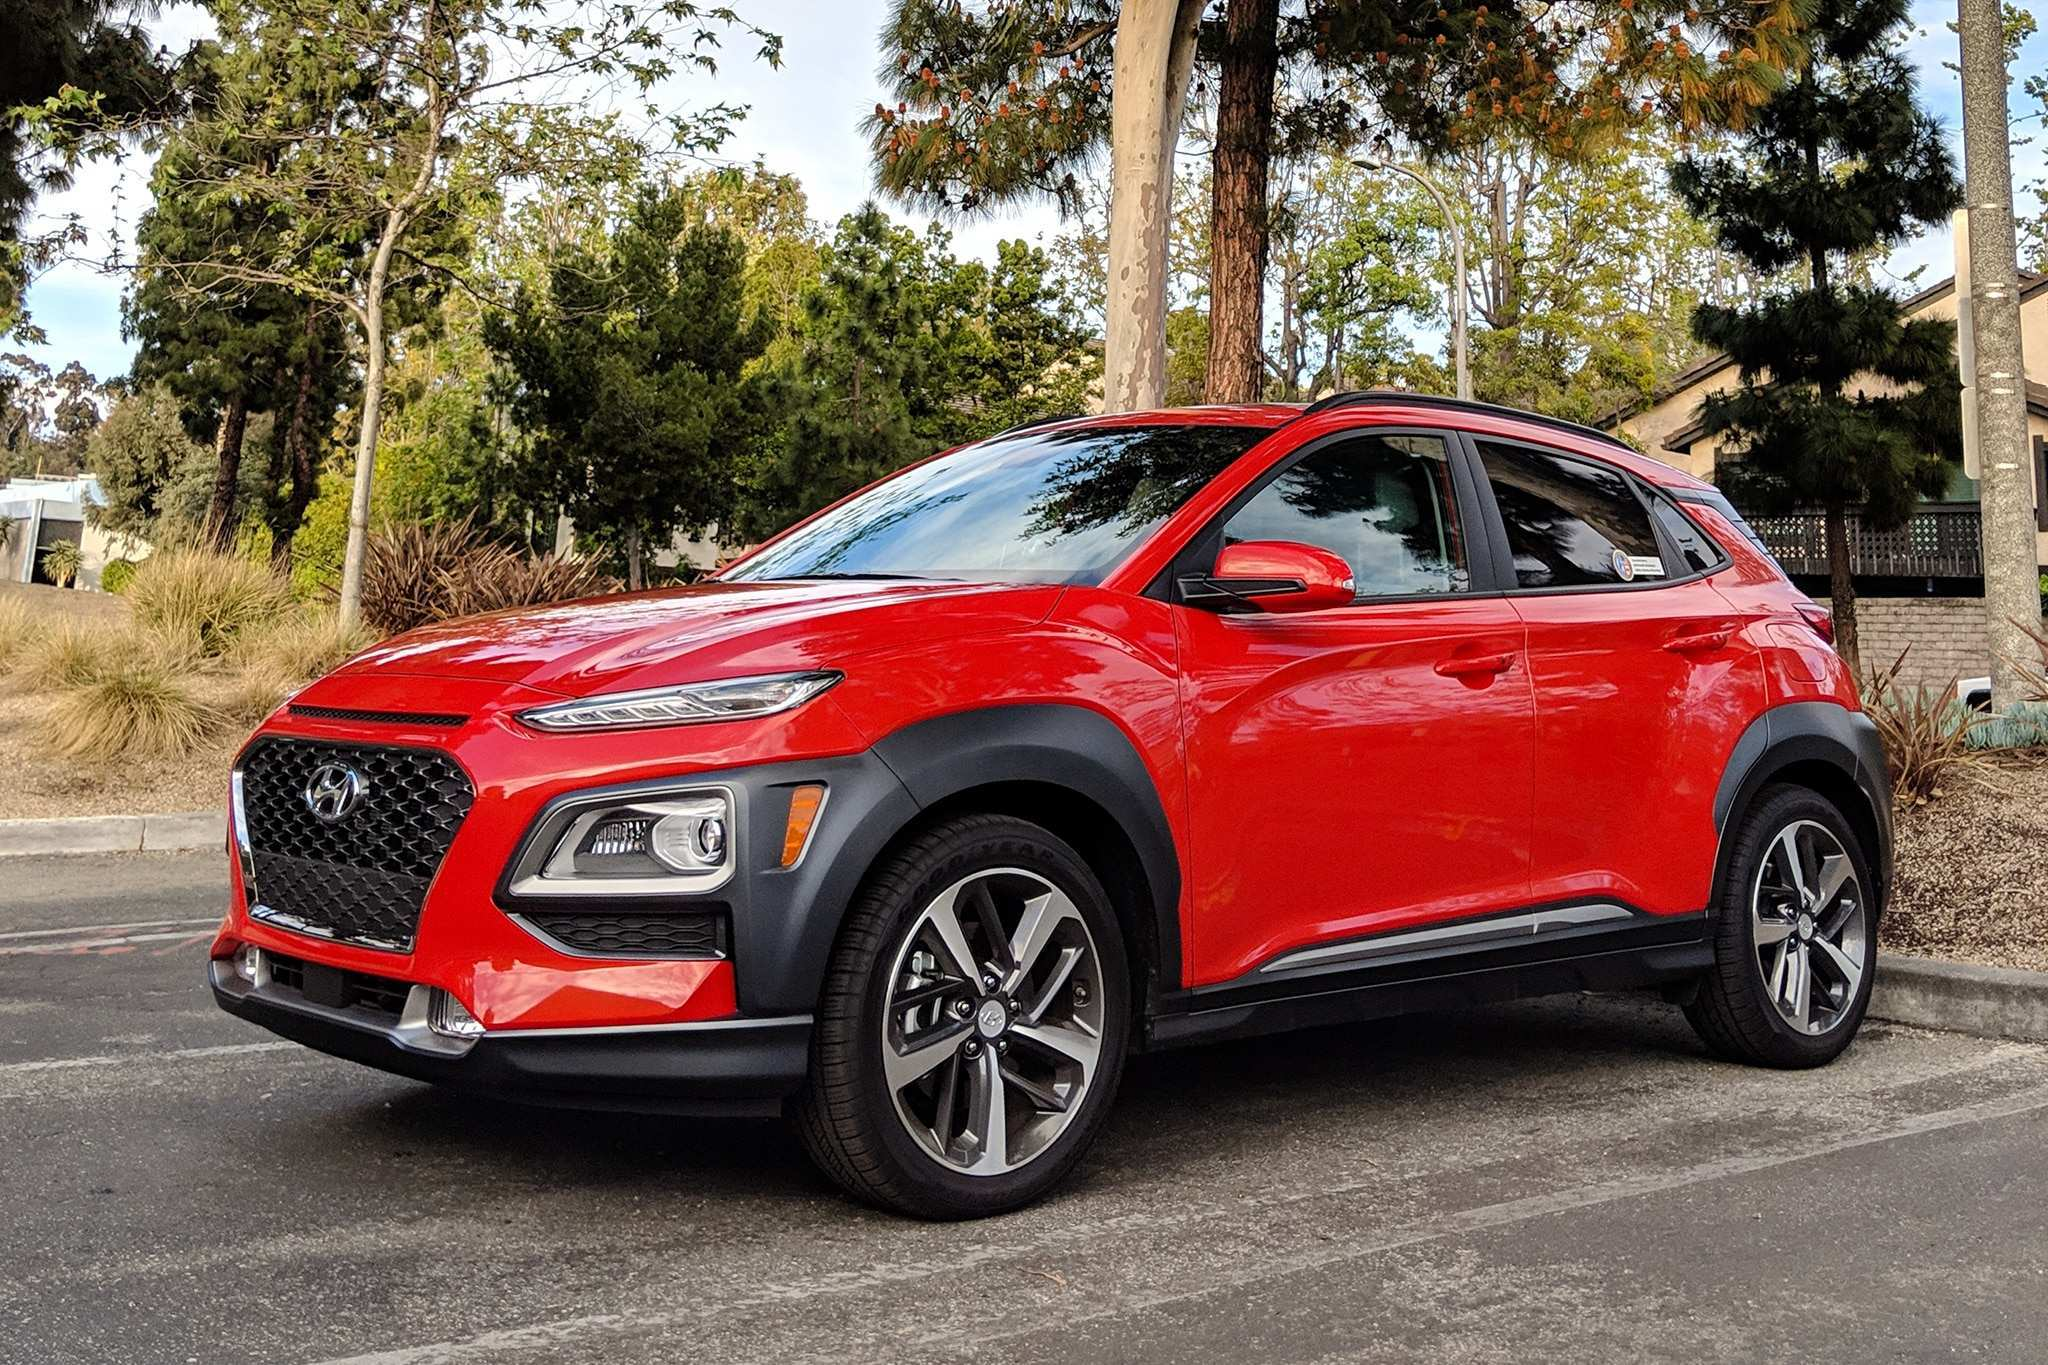 73 New Hyundai Kona 2020 Review First Drive with Hyundai Kona 2020 Review